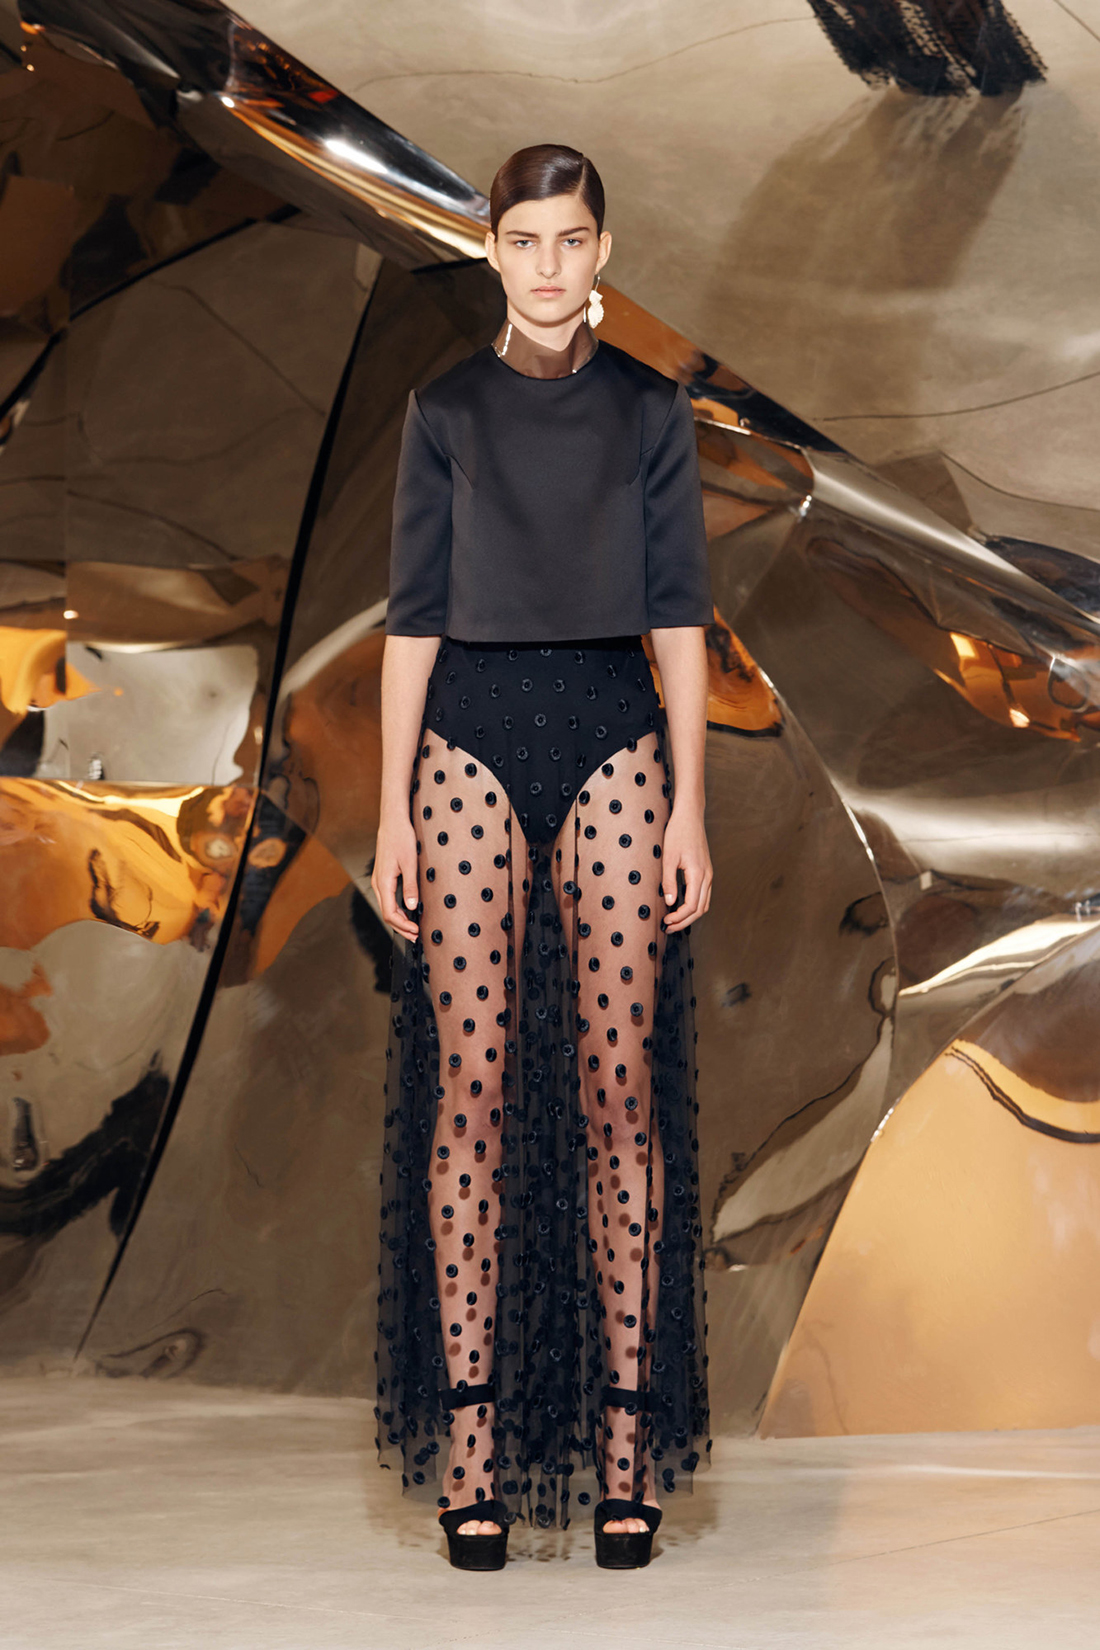 trend-flamenco-polka-dots-13